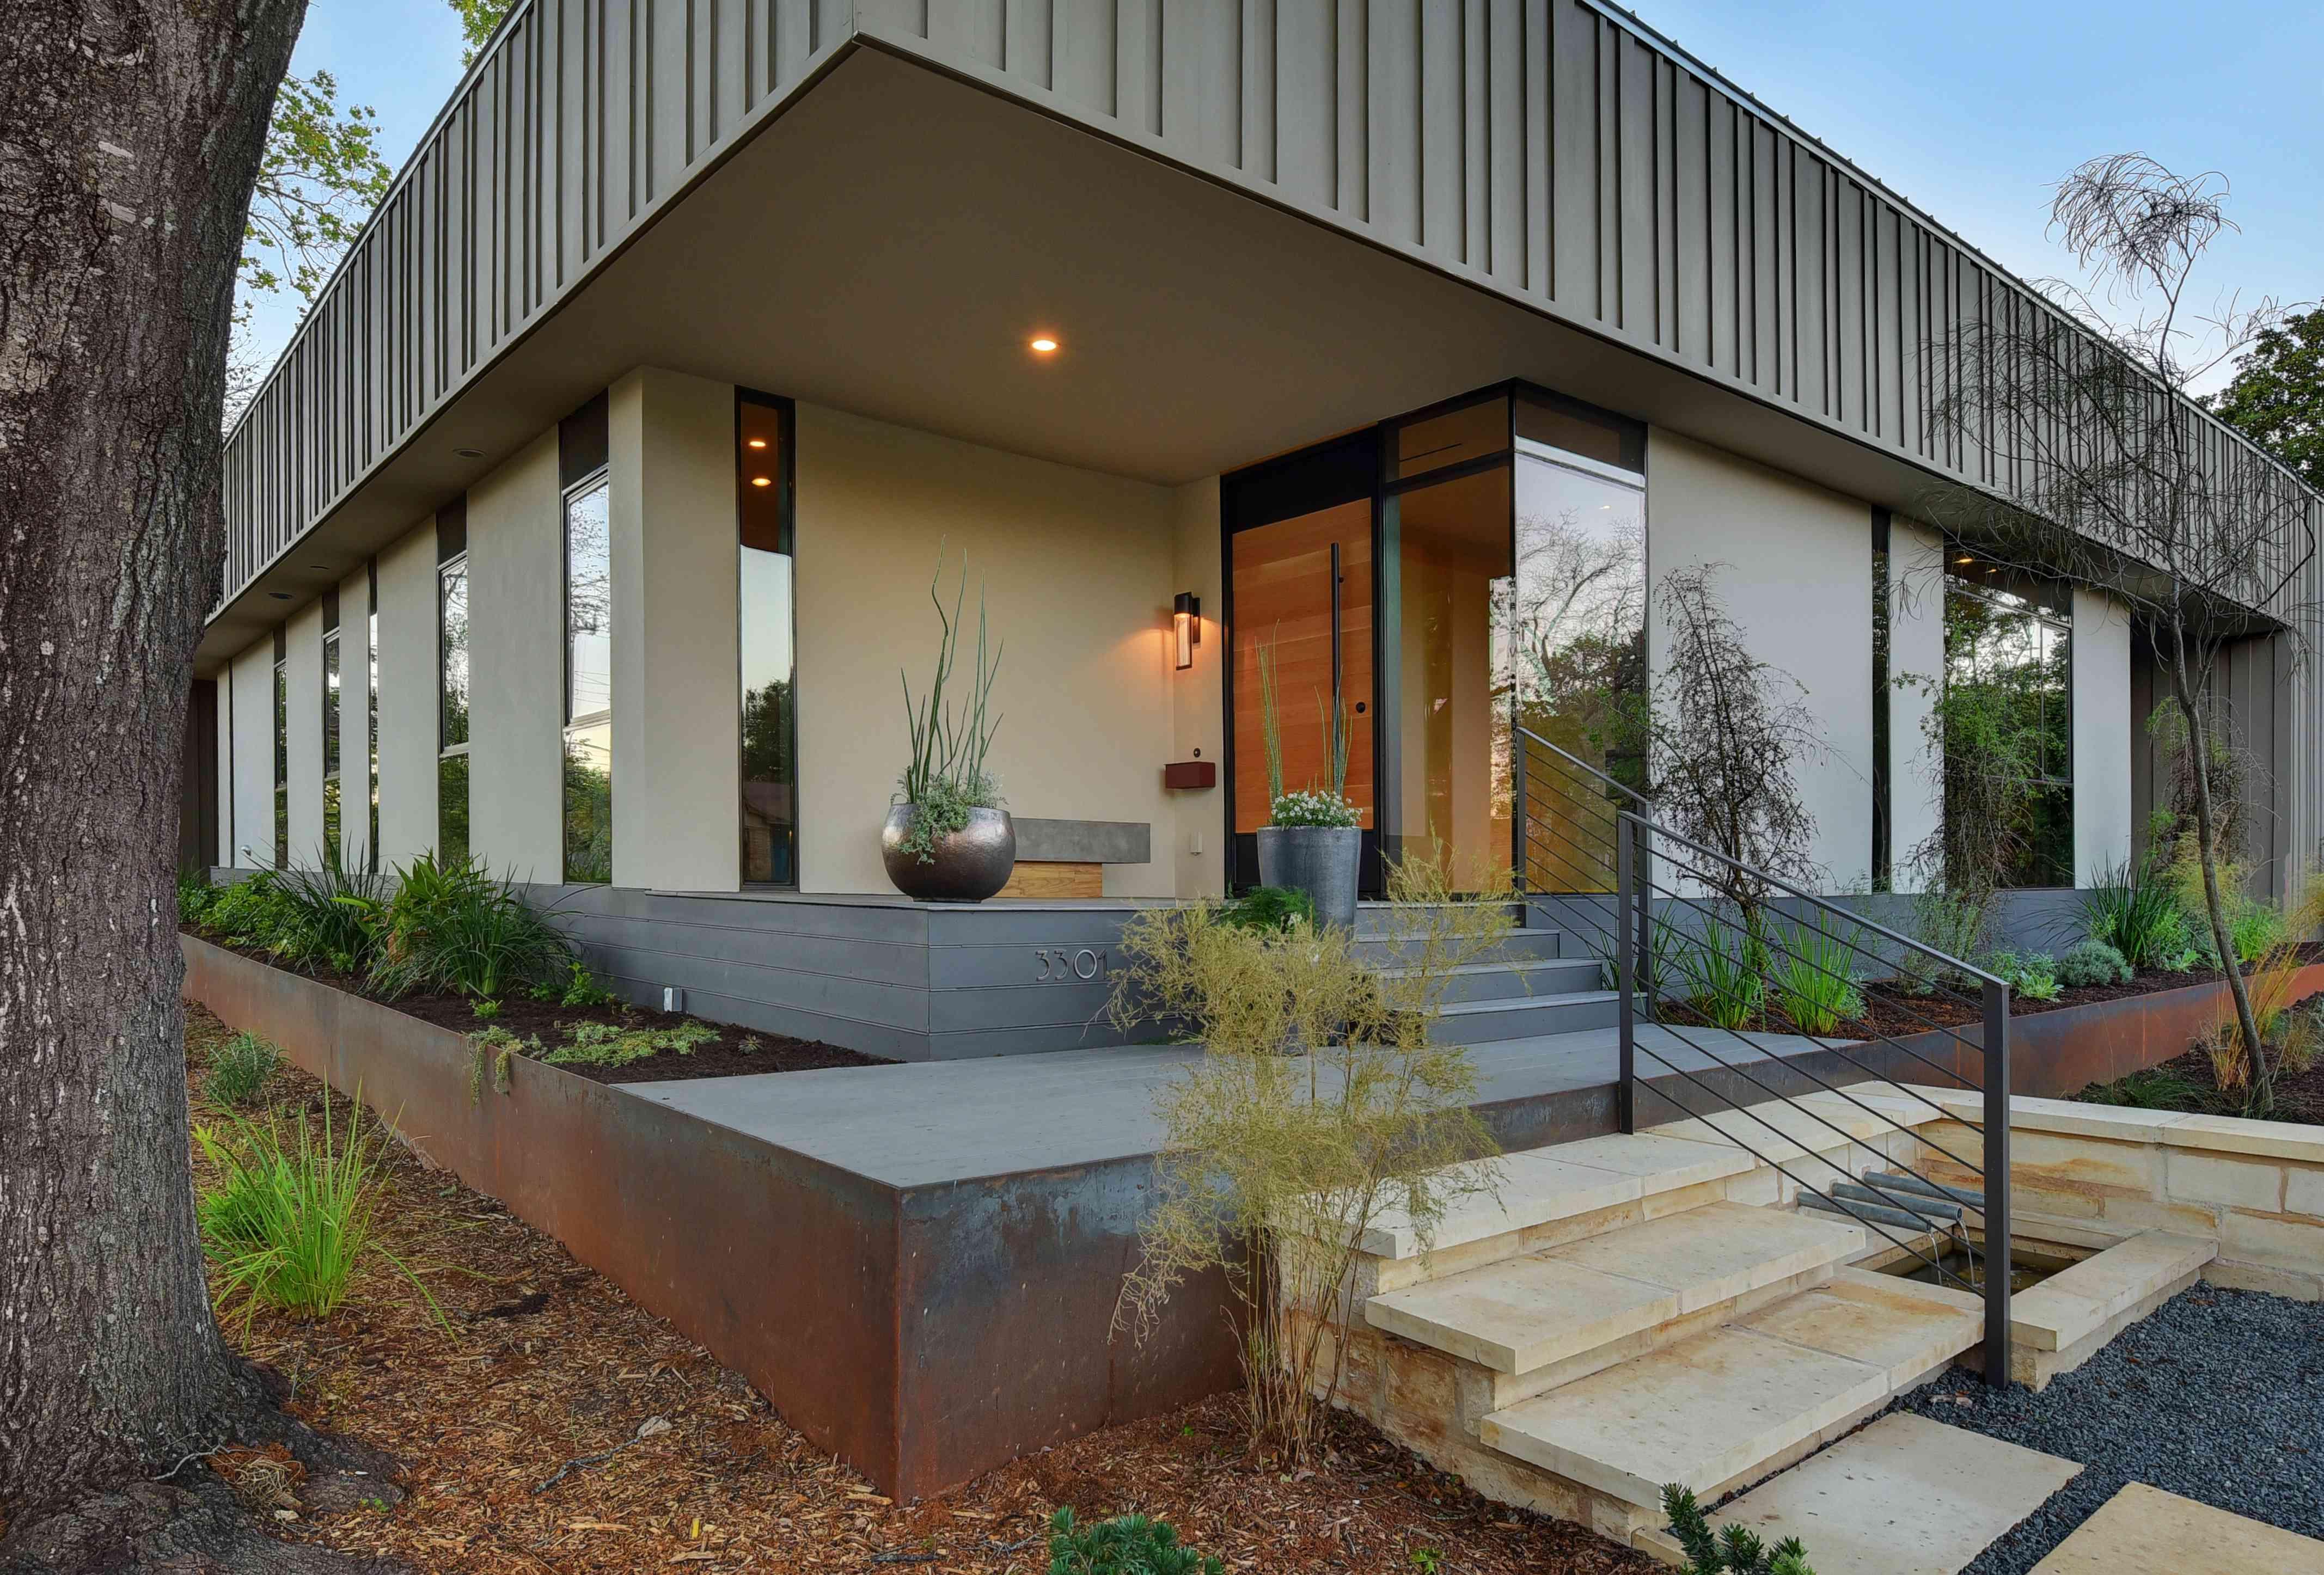 Laura Britt's WELL home in Austin, TX, for Designer Digs